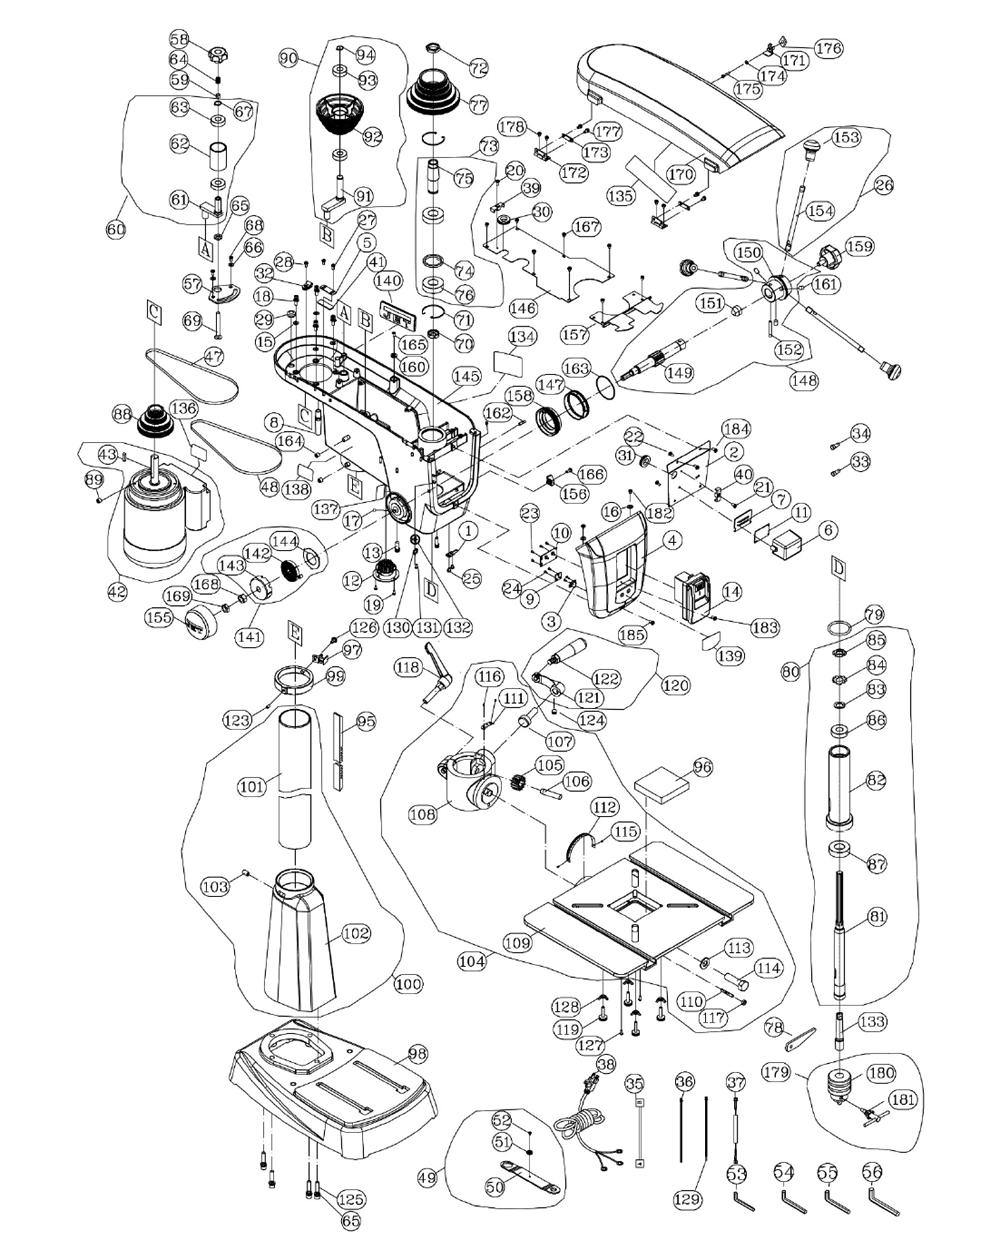 Buy Jet JDP-17-(716300) 16-speed Woodworking Drill Press